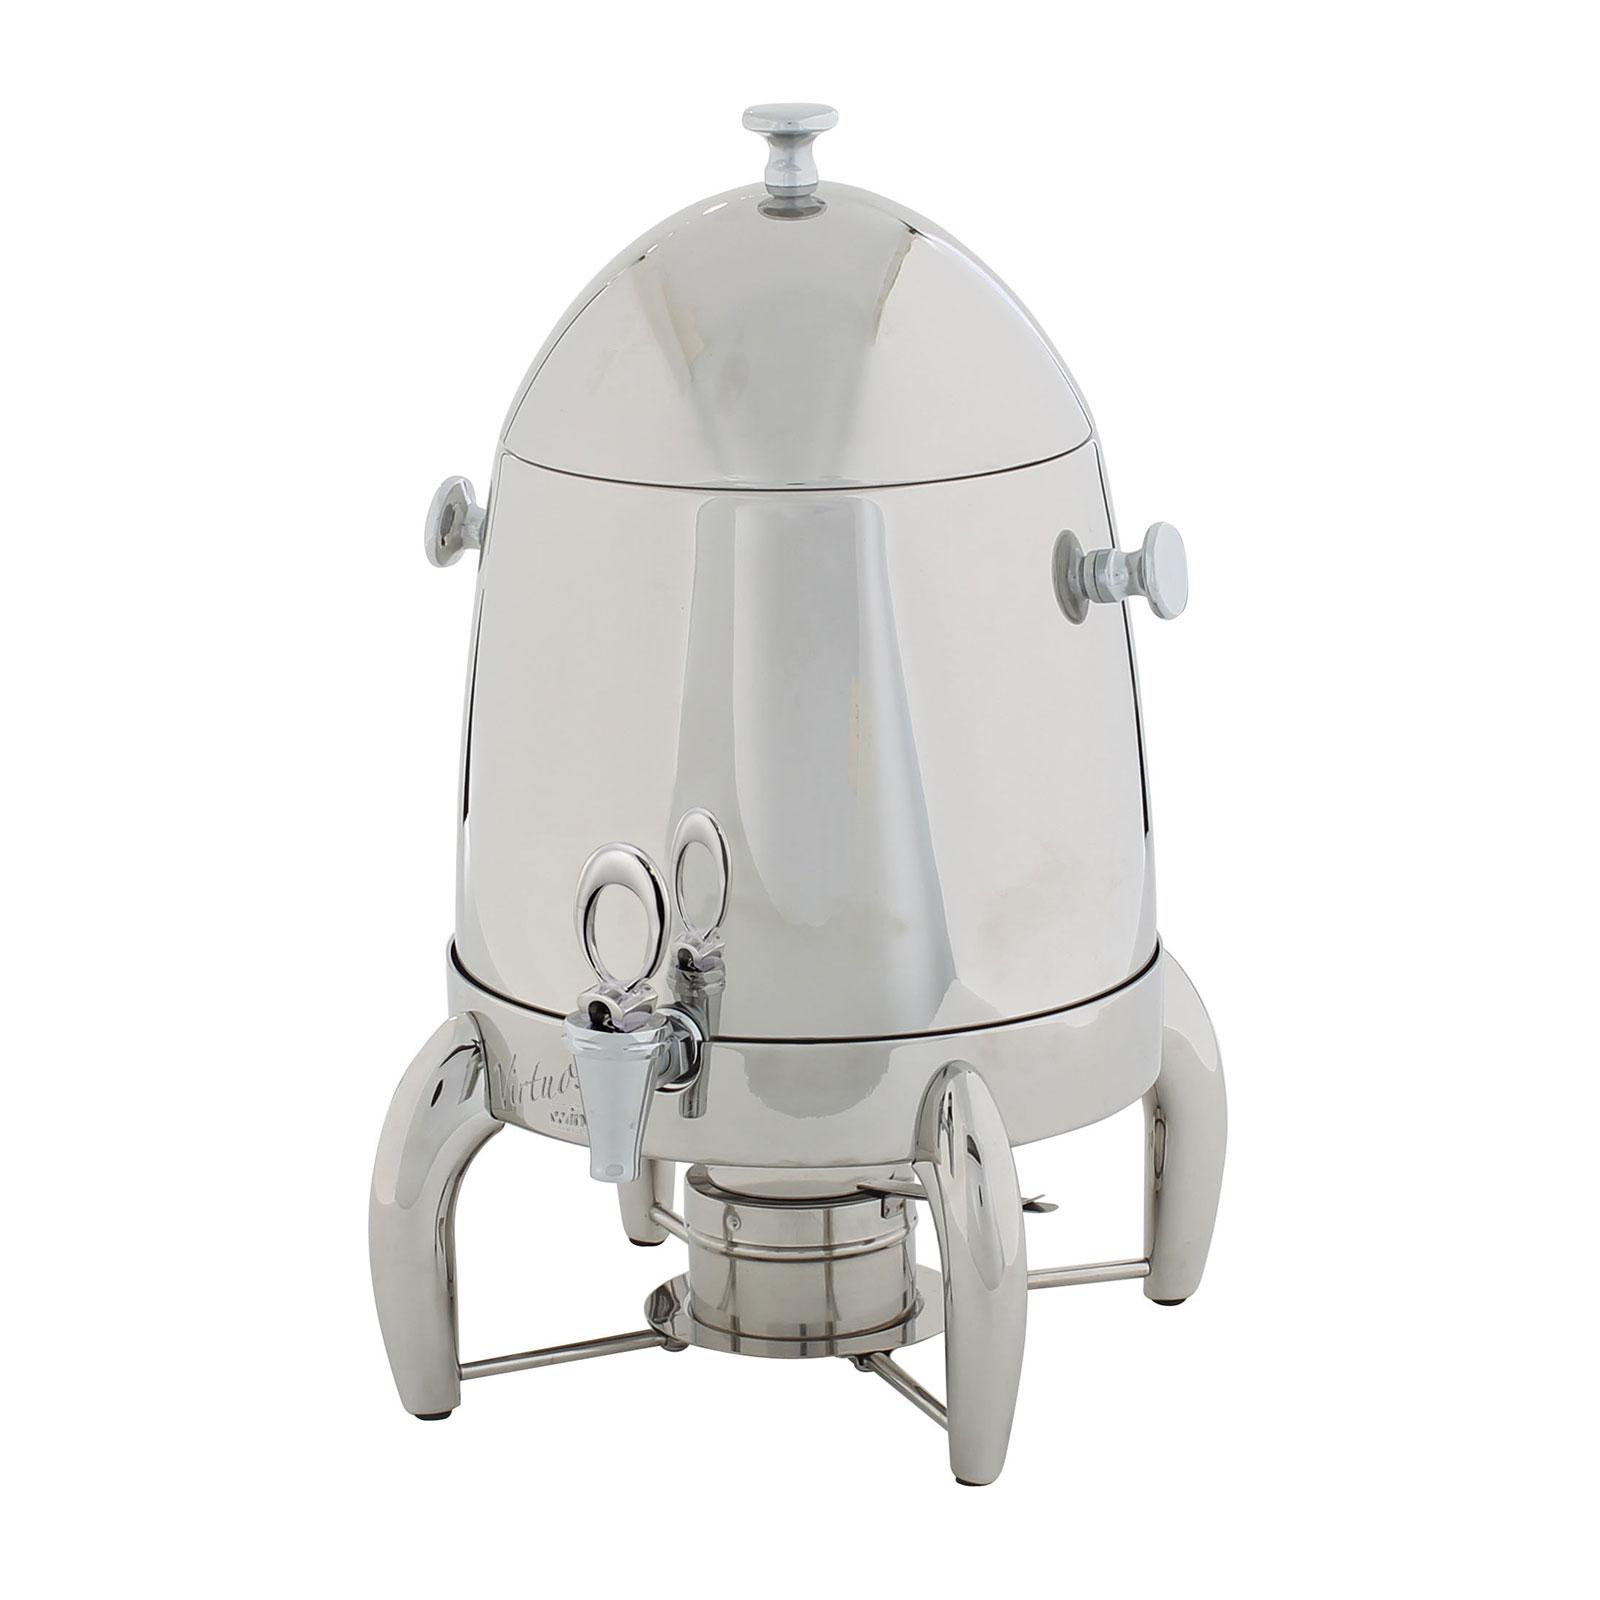 Winco 903B coffee chafer urn